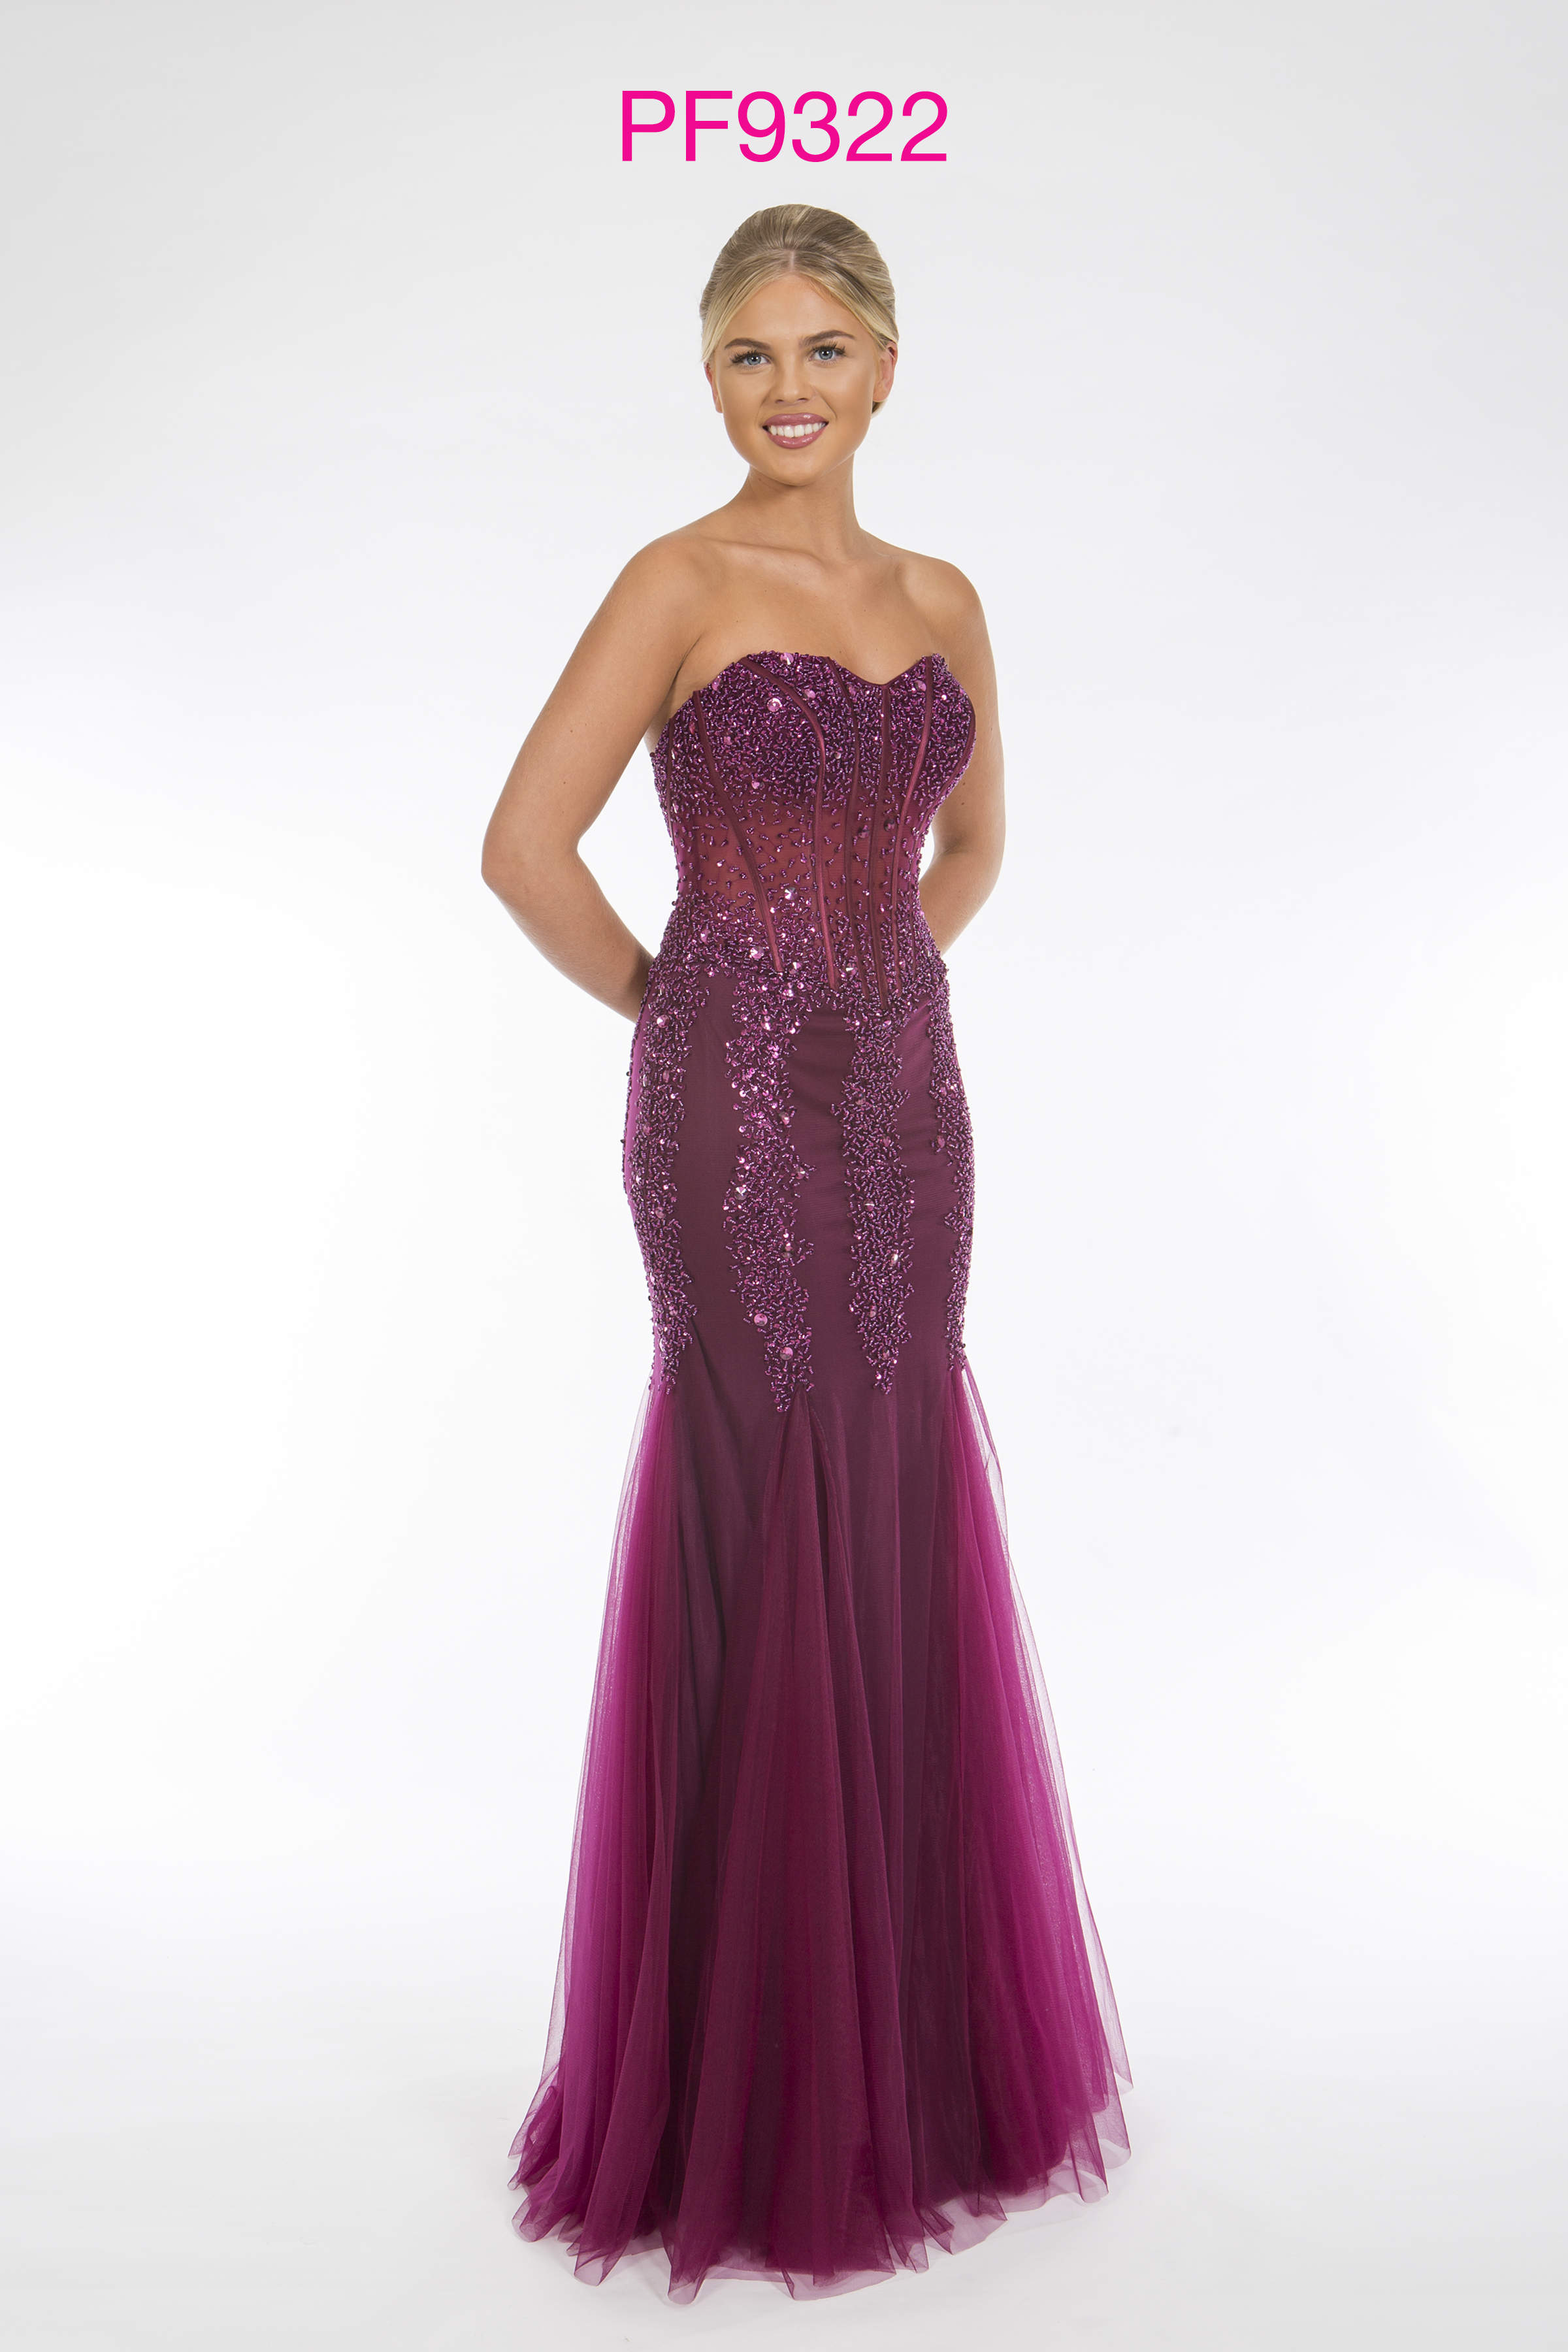 5595400f85eae KissyDress UK:Purple Prom Dresses|UK Purple Prom Gowns for .